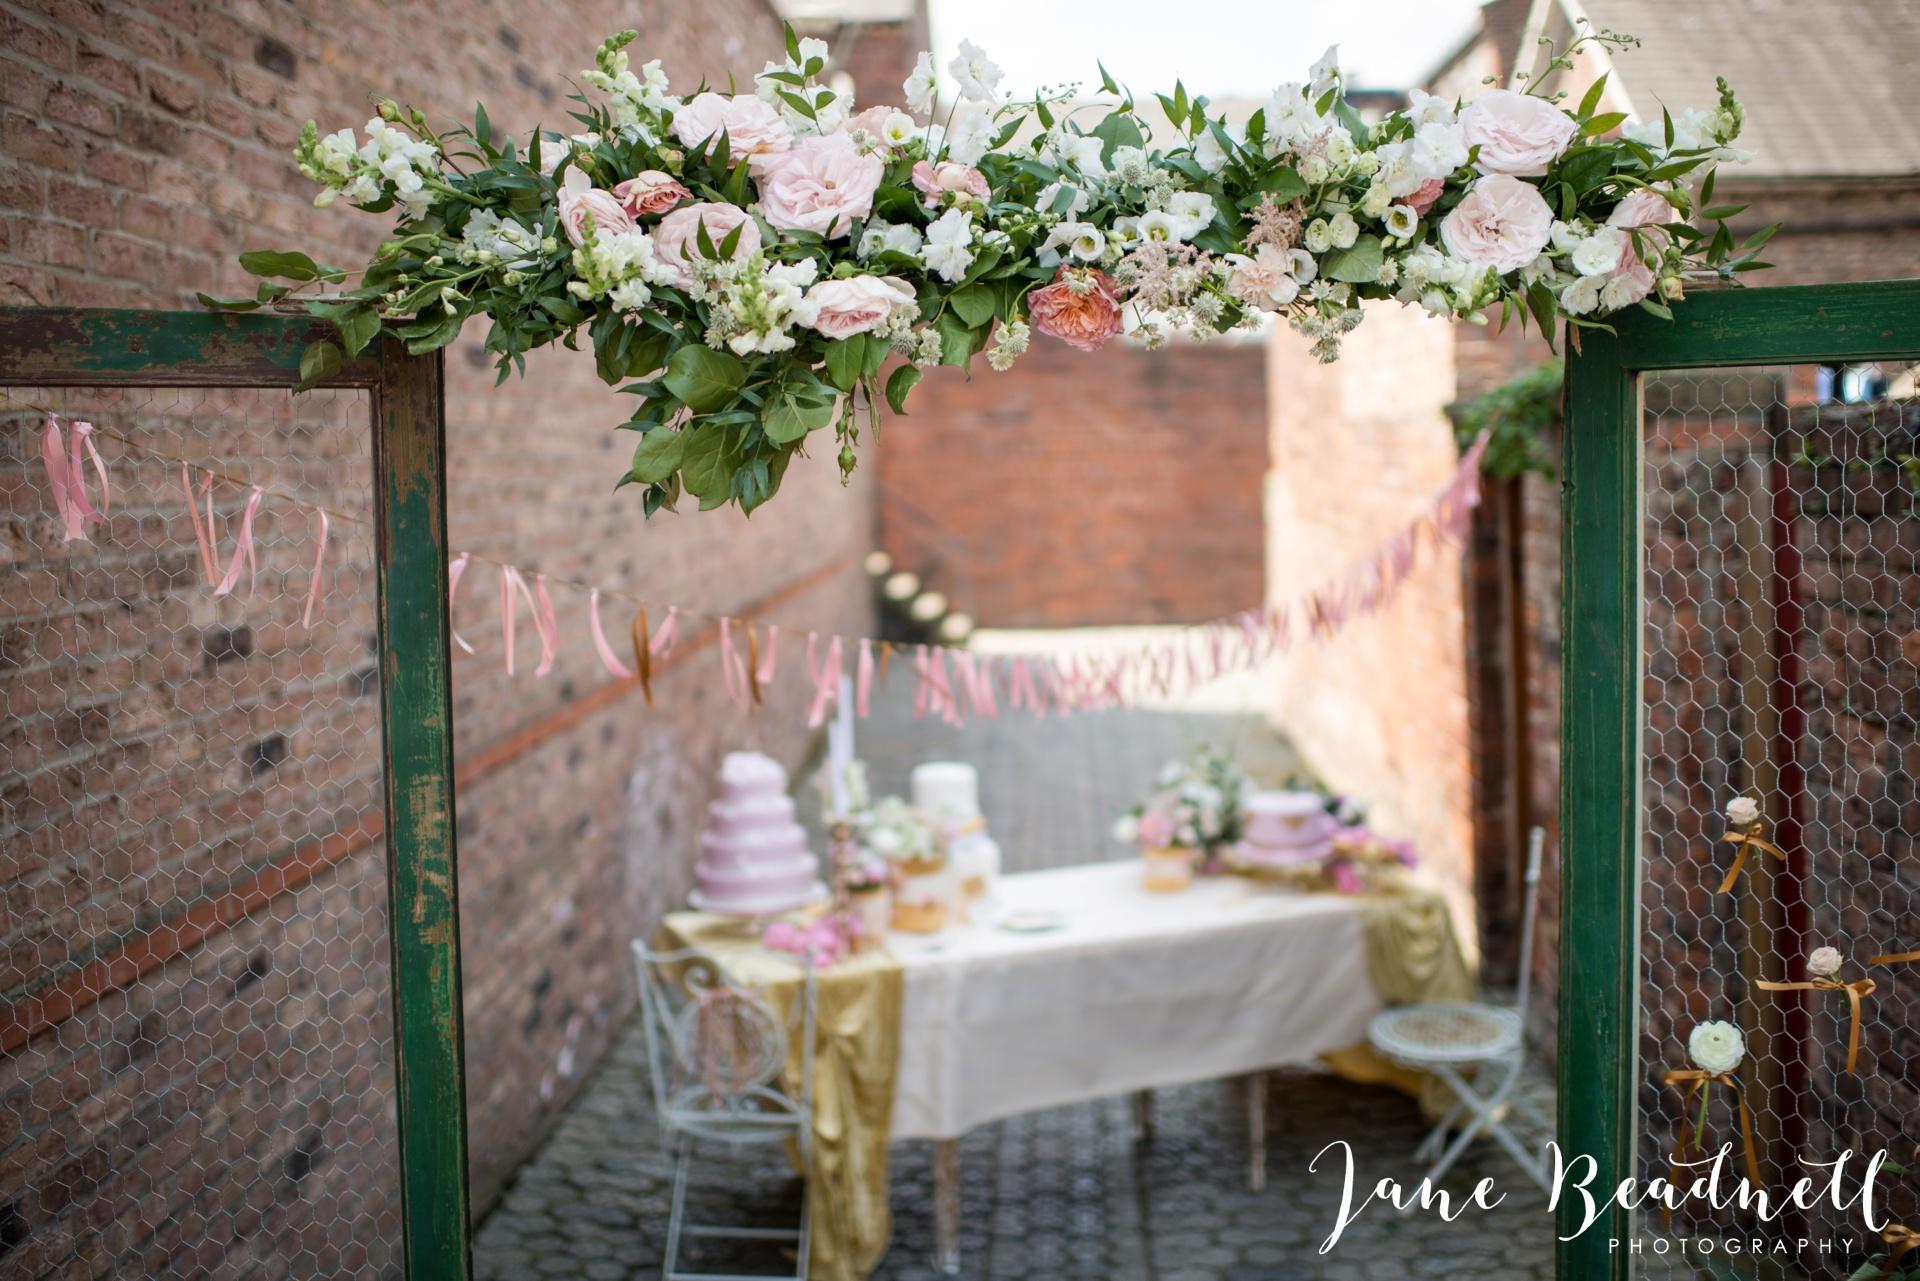 Jane Beadnell fine art wedding photographer York Bridal Photo Shoot_0006